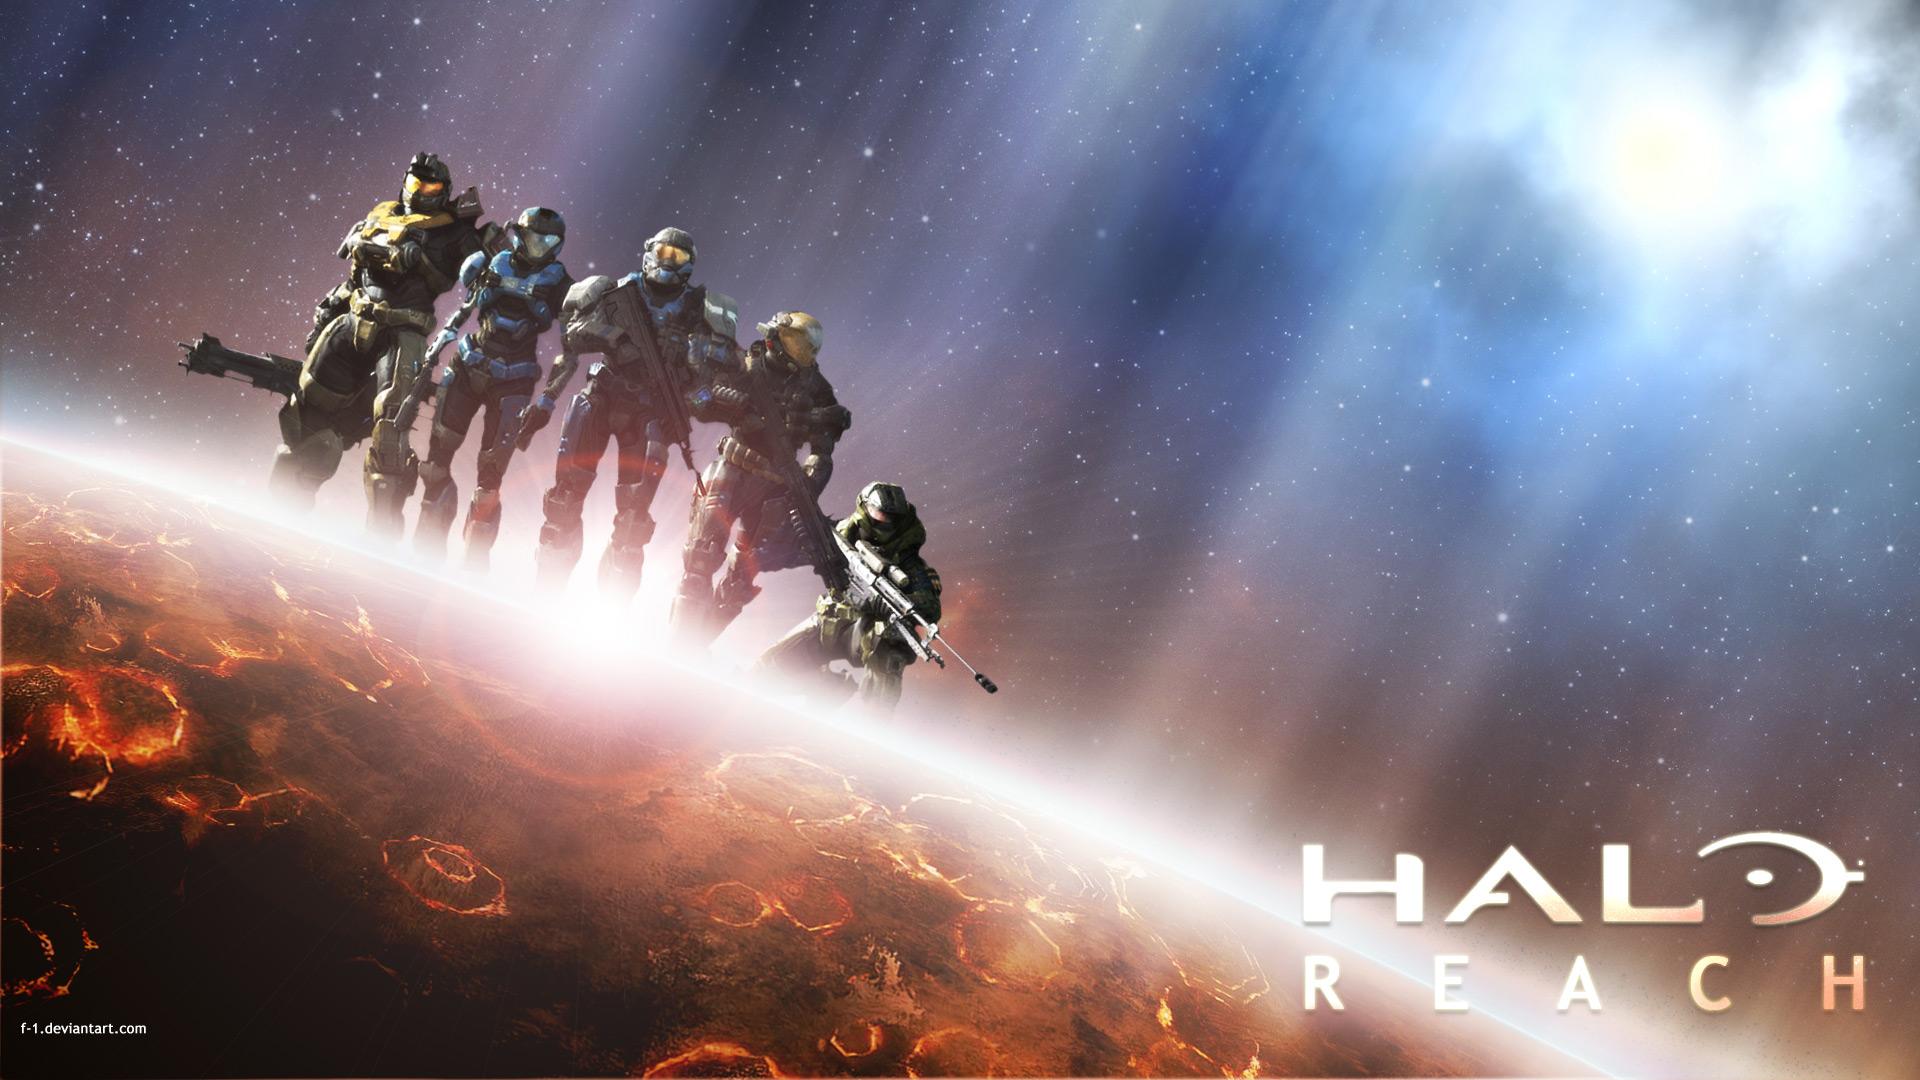 Halo Reach fechado para Septiembre [Oficial]